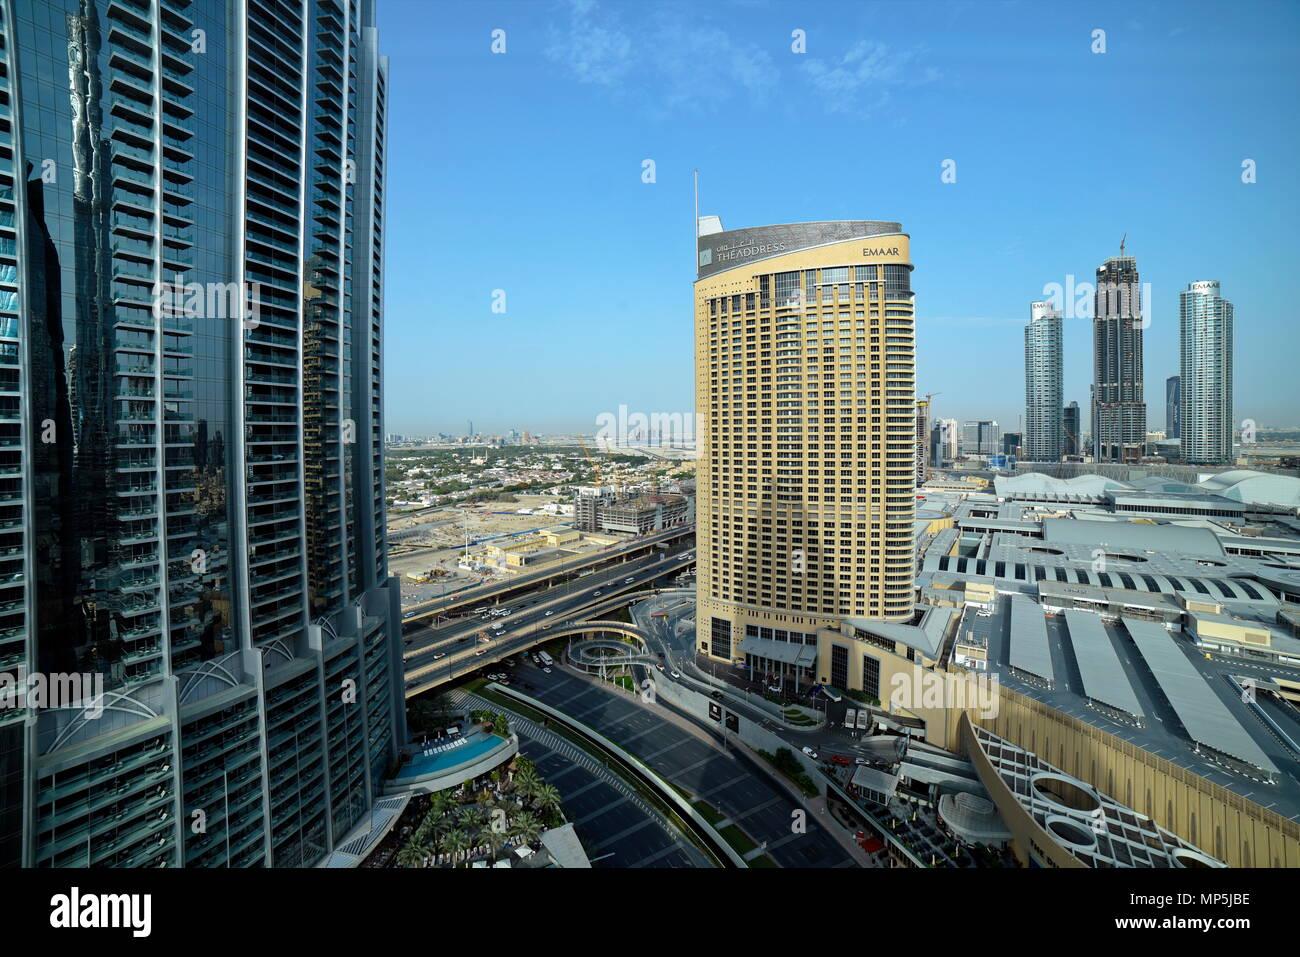 Dubai, Vereinigte Arabische Emirate - Mai 17, 2018: Sheikh Mohammed Bin Rashid Boulevard, der Dubai Mall und Burj Khalifa, dem Downtown Dubai, die Tal bekannt Stockbild